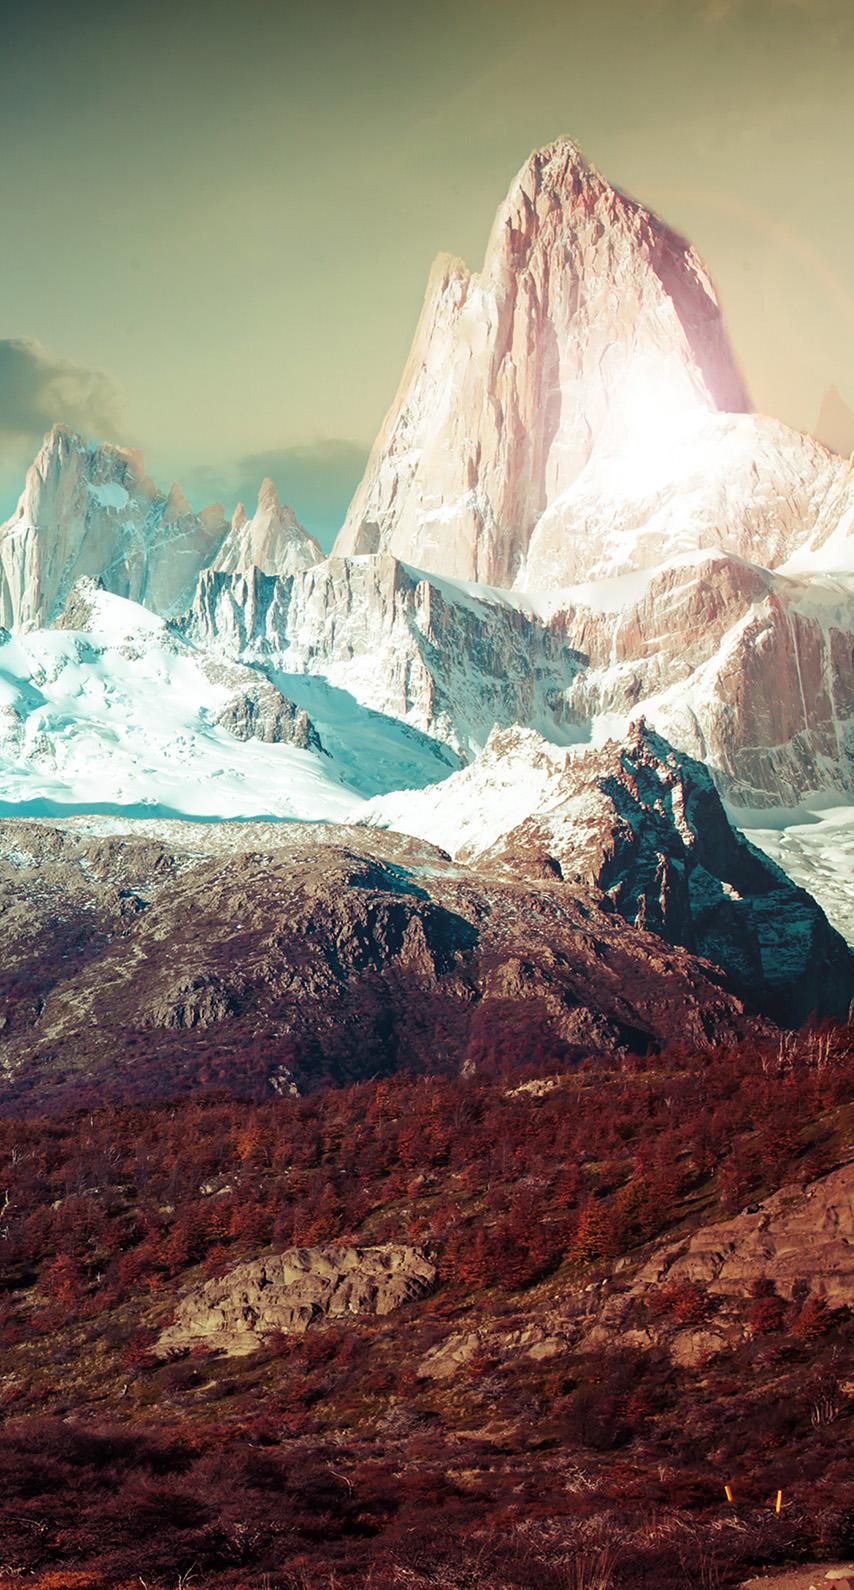 valley, bright, ice, food, mountain, no person, dawn, high, cold, mountain peak, glacier, climb